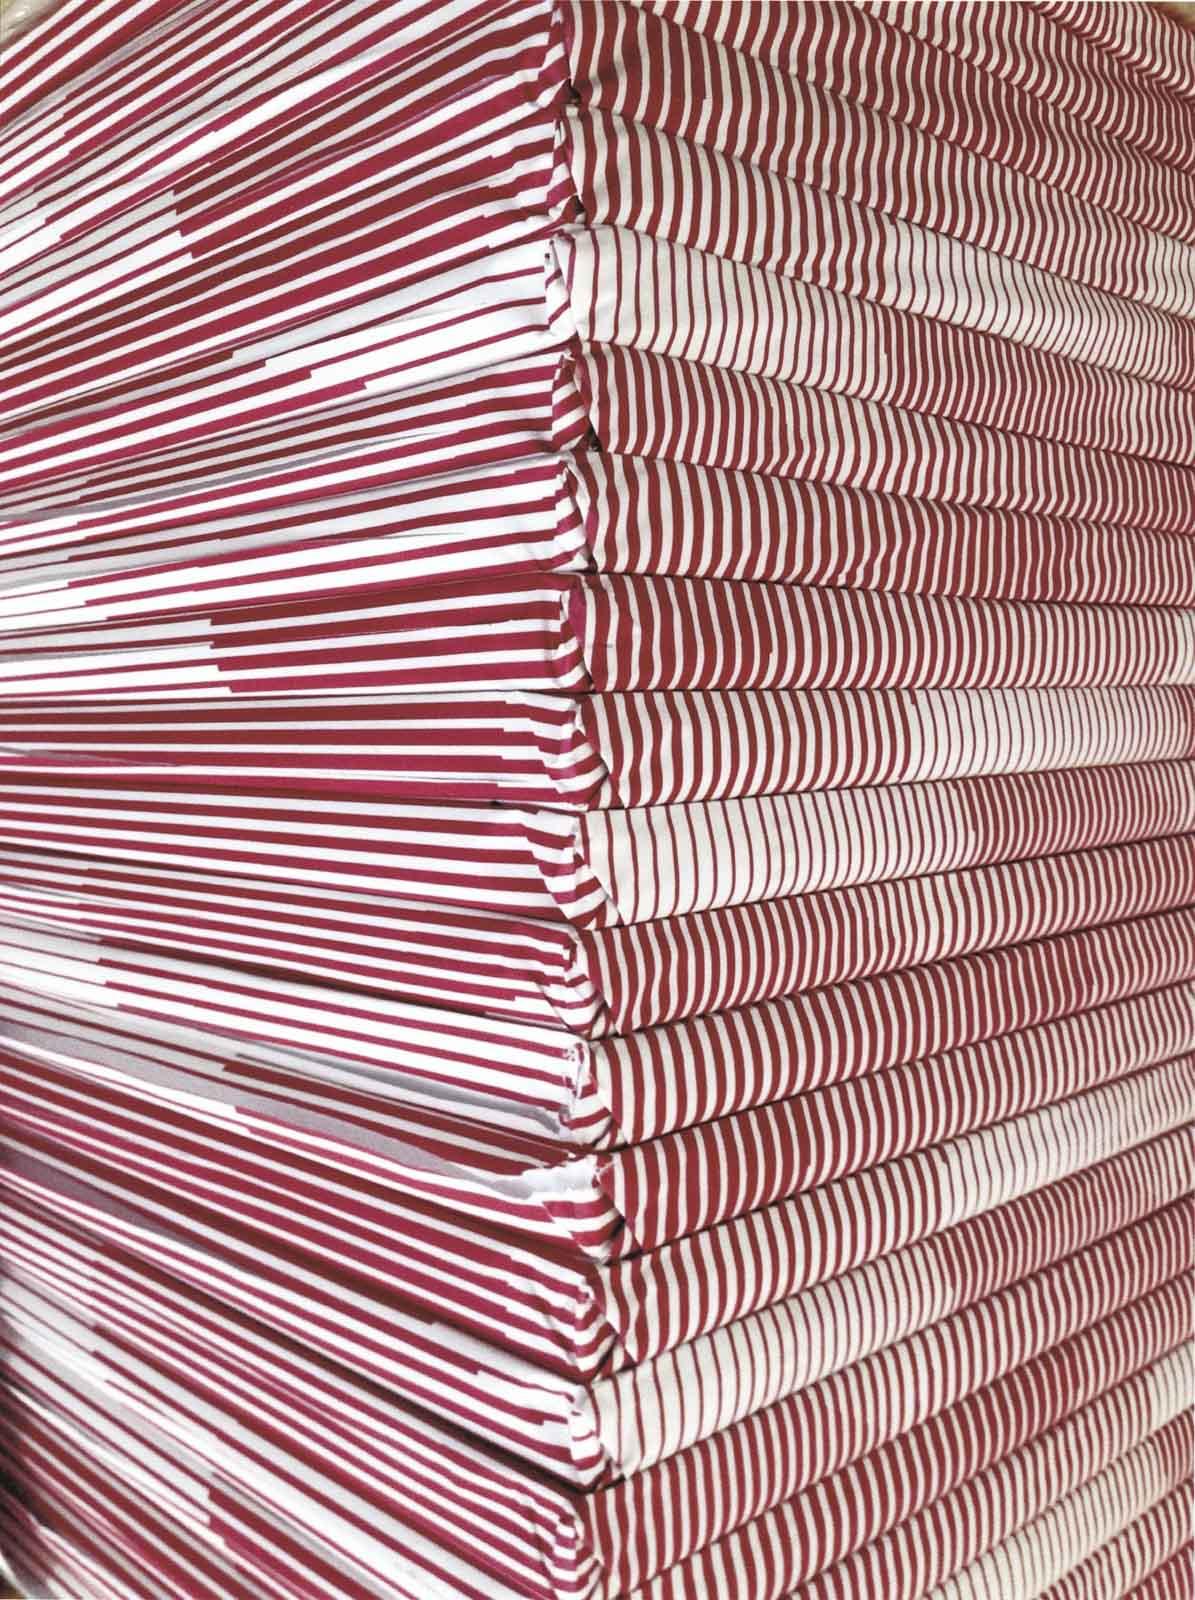 corner red/white, 2017, archival inkjet print, 146,6 x 110 cm, Edition 5